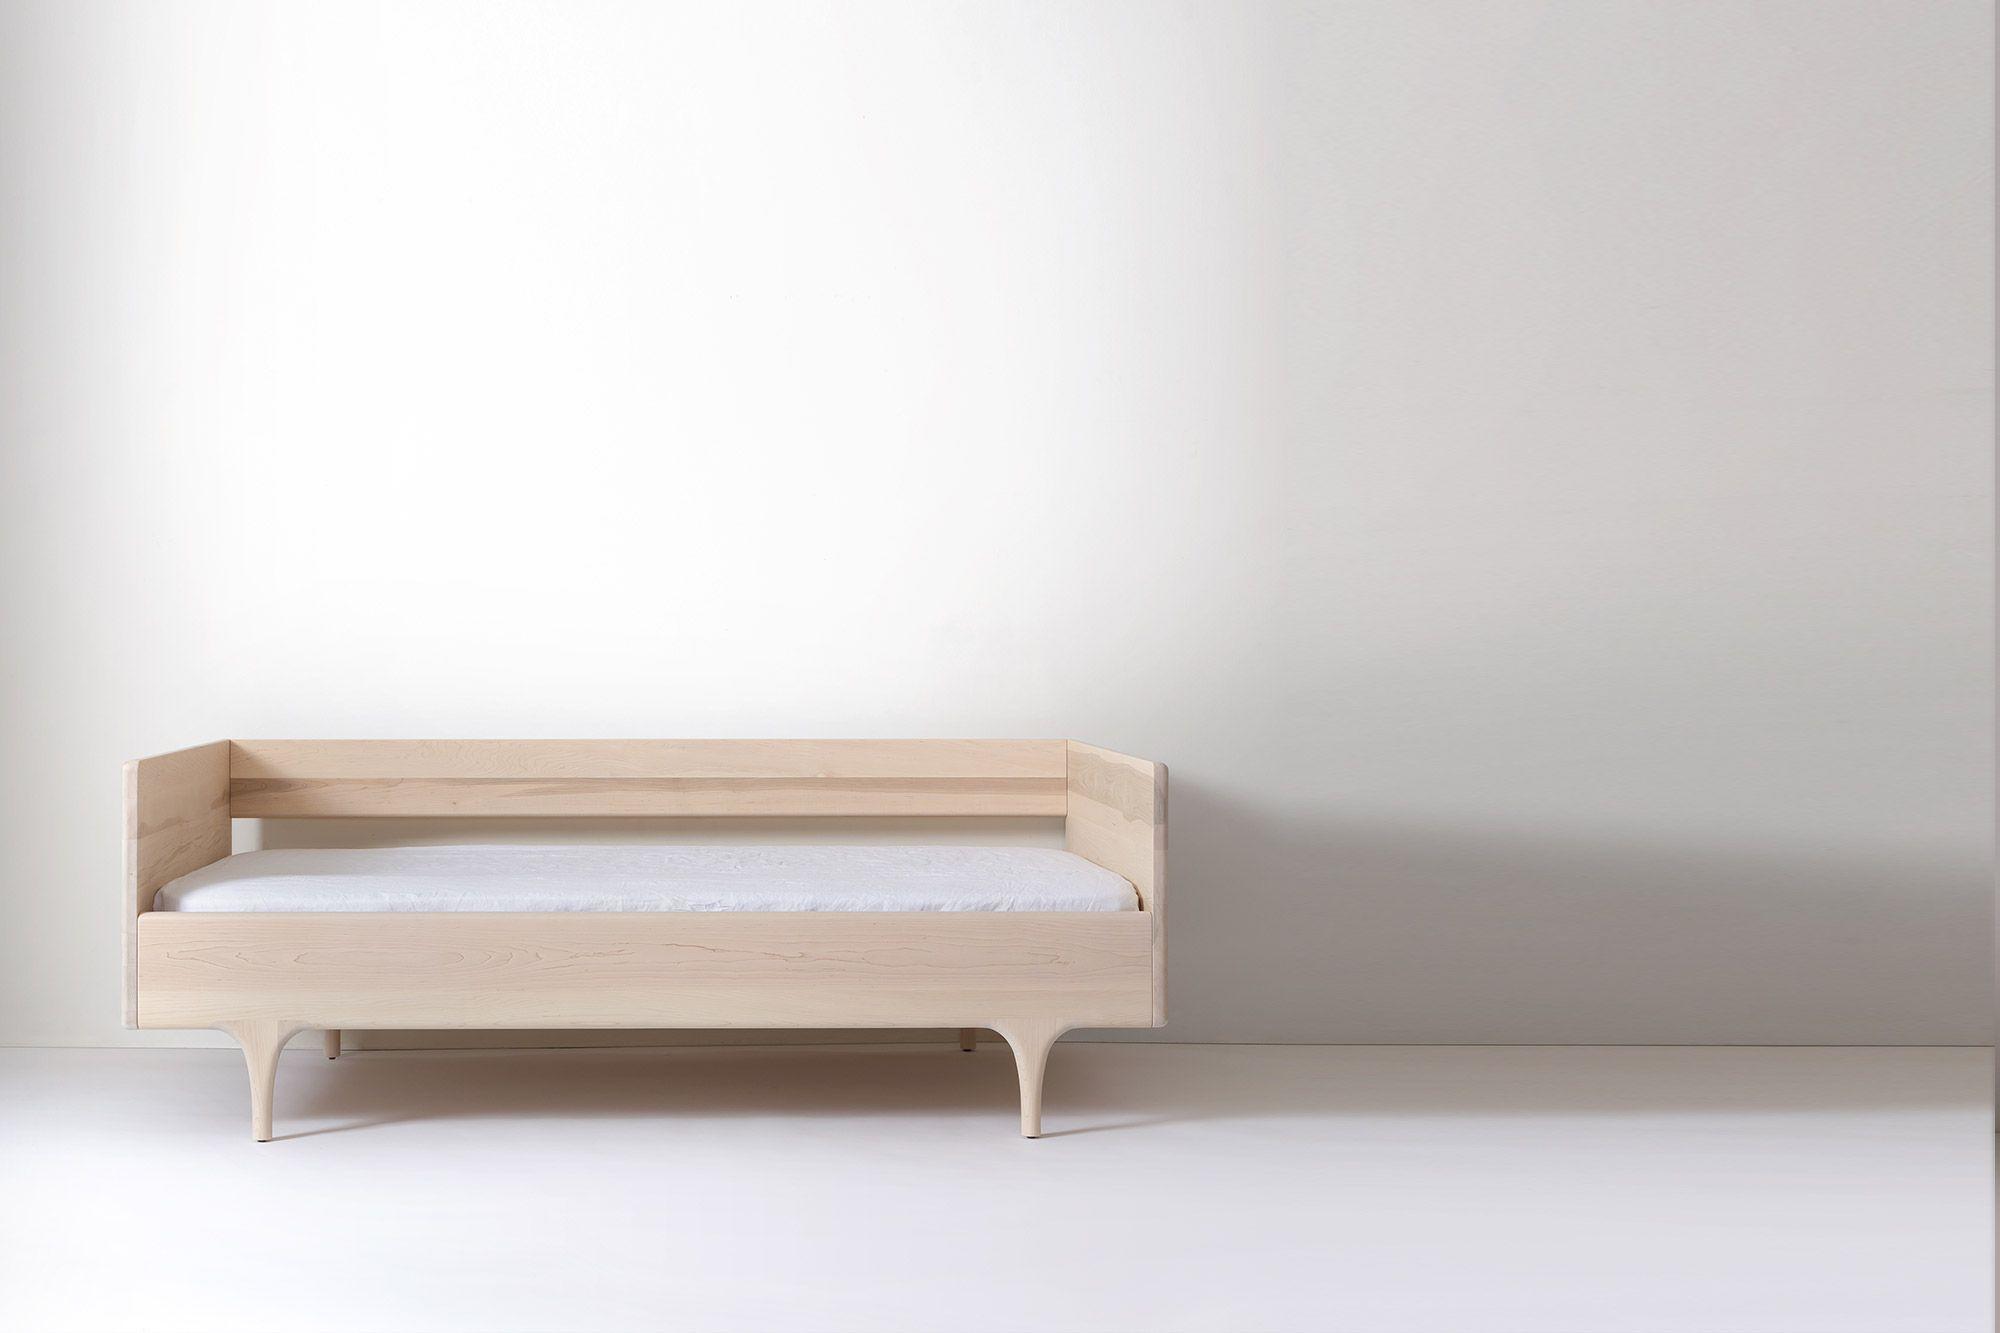 Divan Twin American Furniture Furniture Mattress Slats